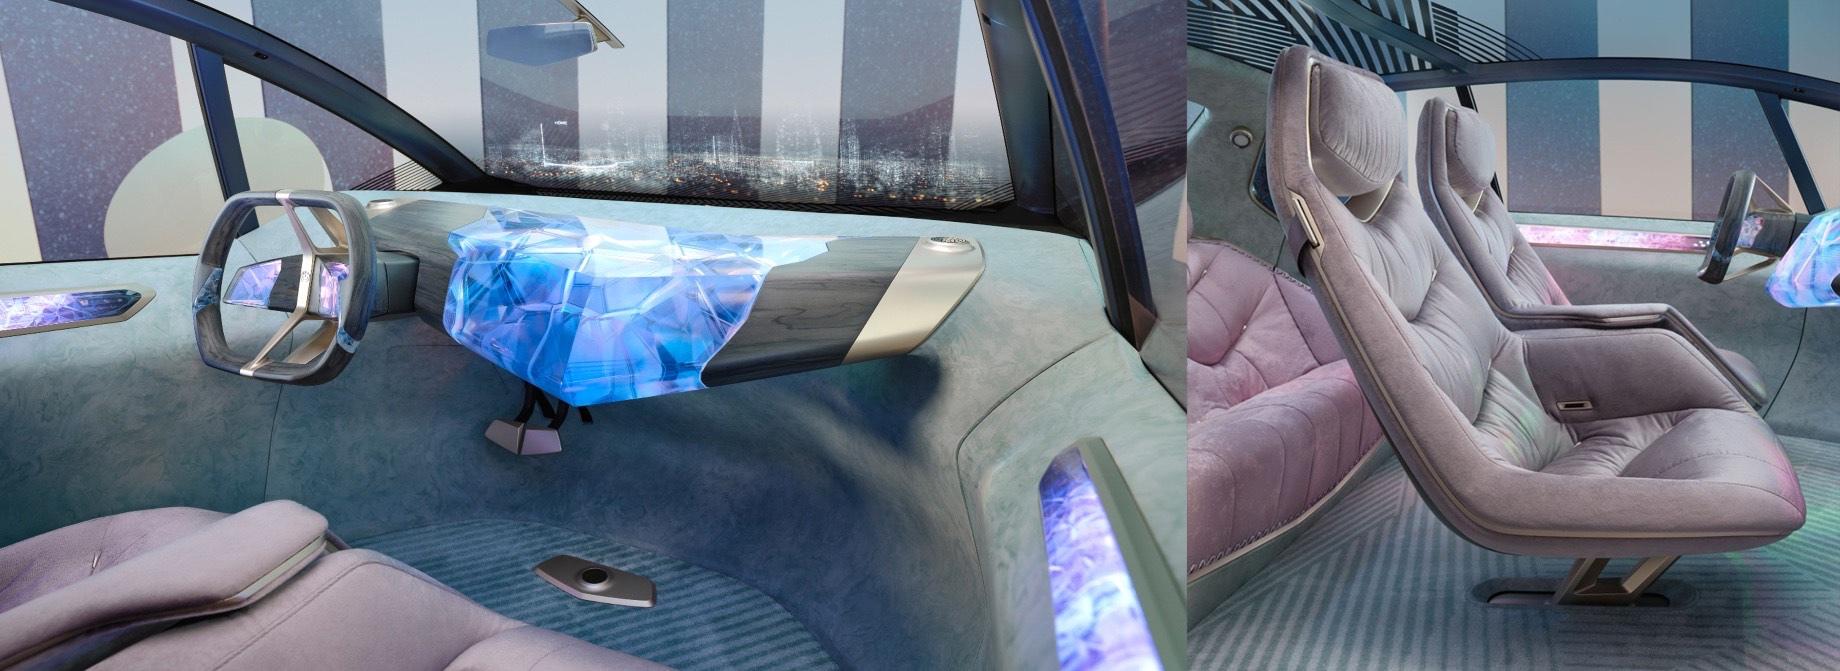 Концепт BMW i Vision Circular воспел экономику замкнутого цикла